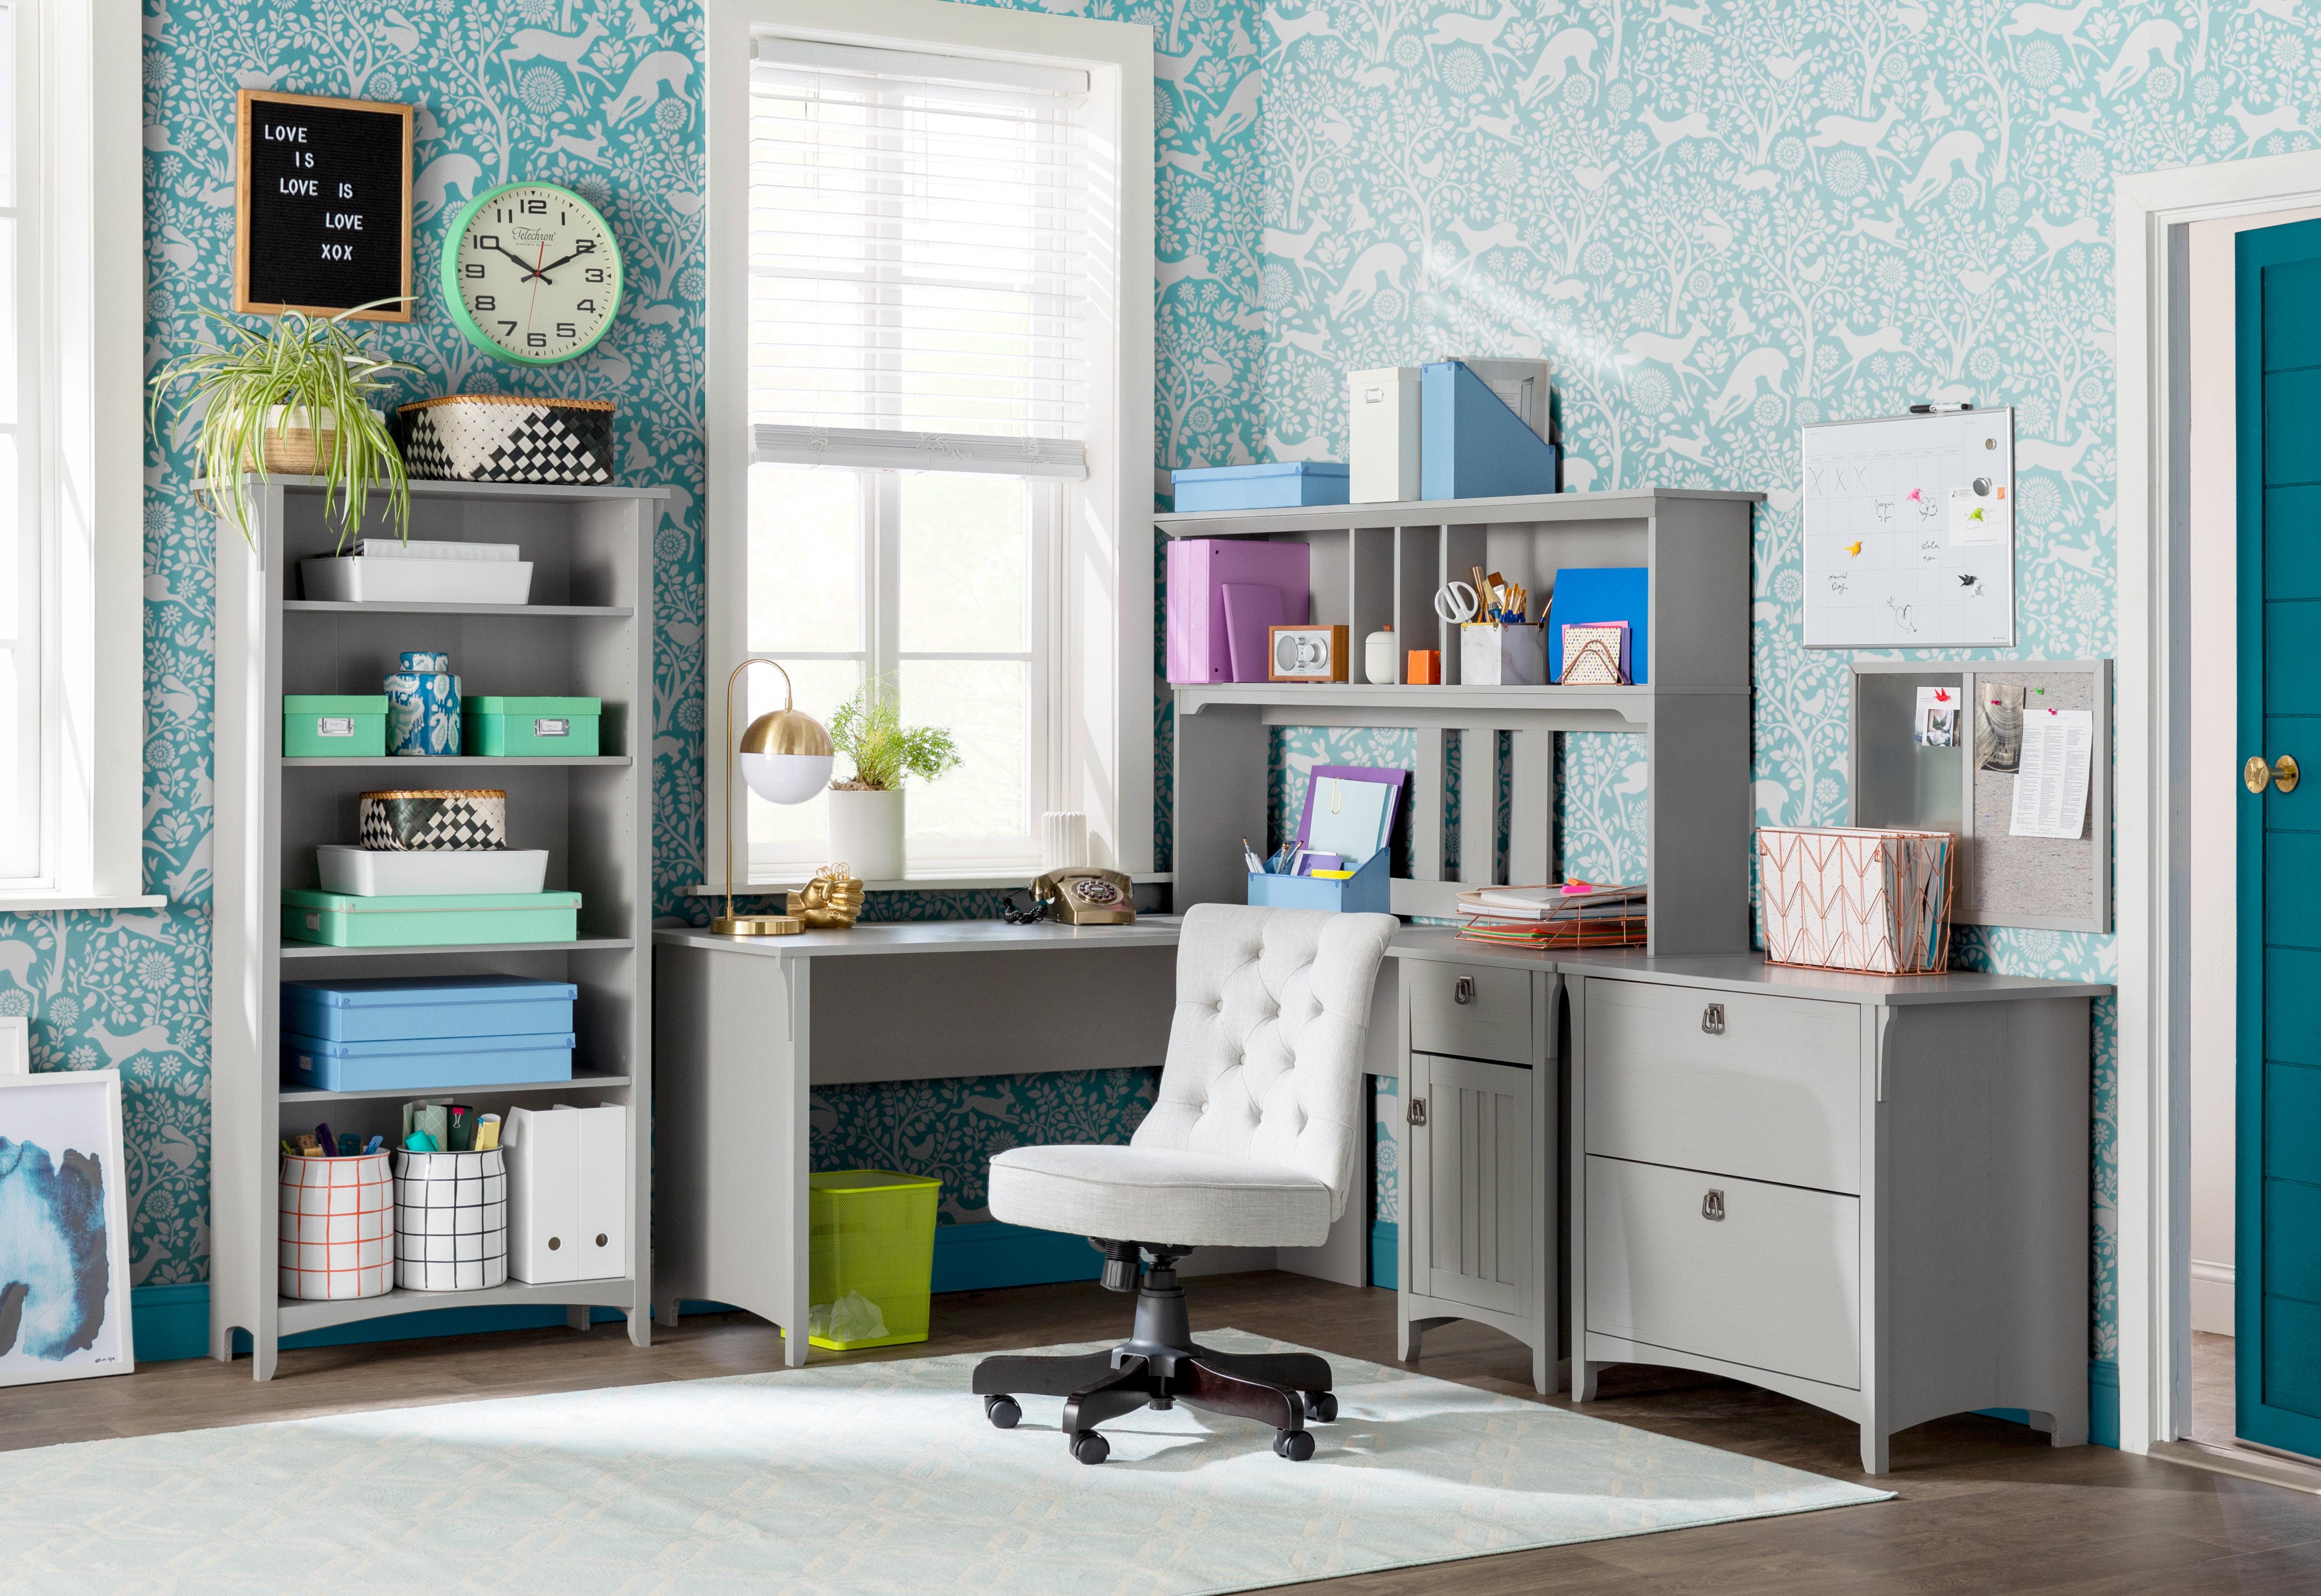 - 7 Desk Organization Ideas Wayfair